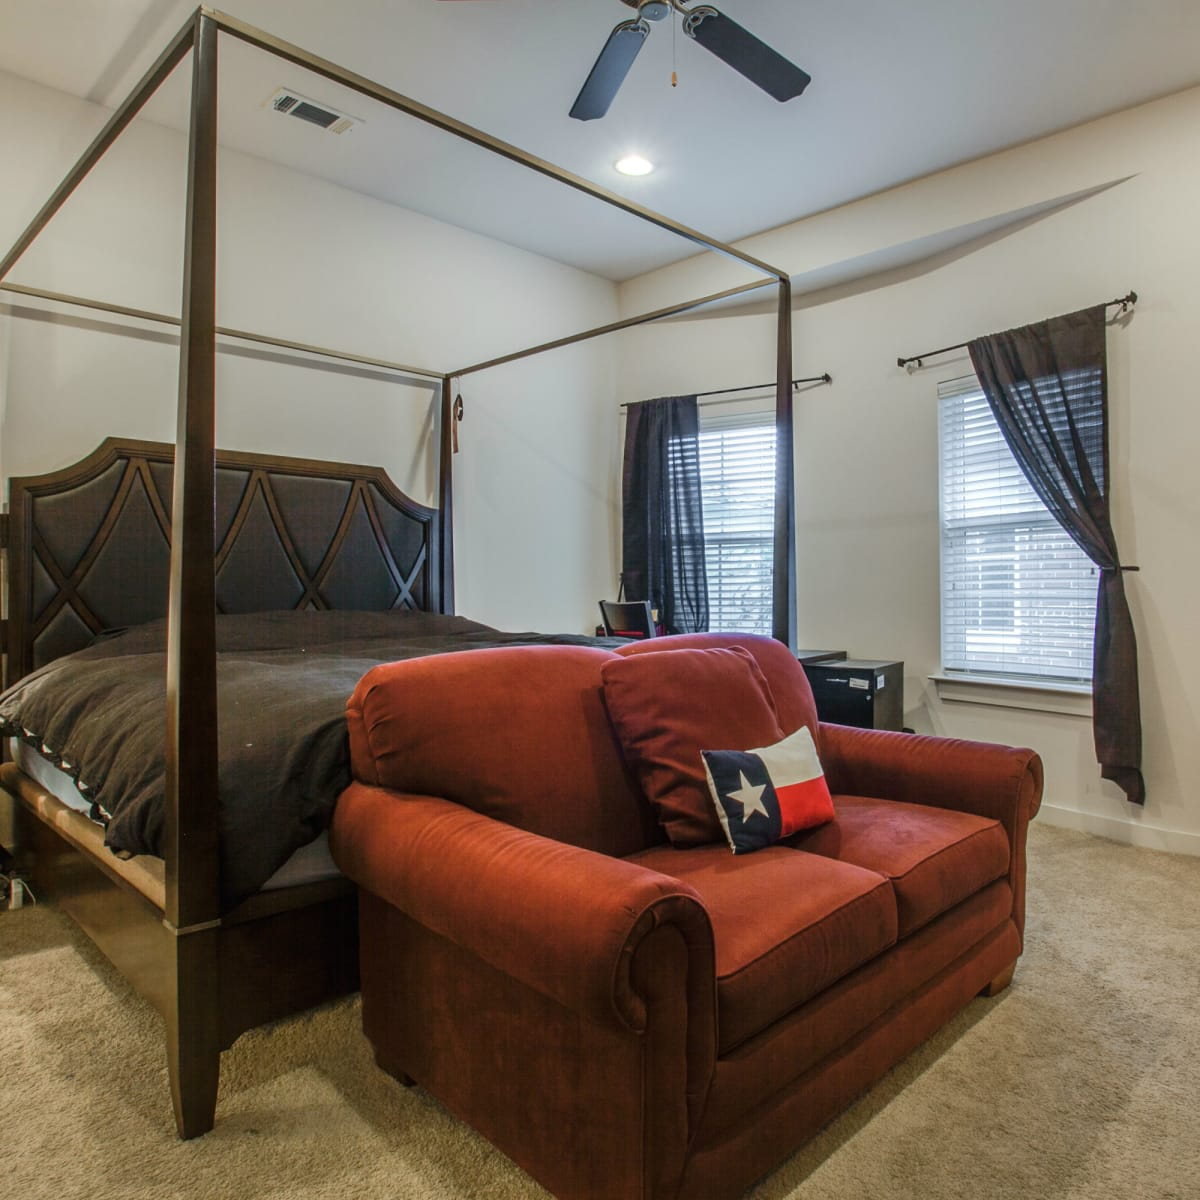 3200 Ross Ave in Dallas master bedroom